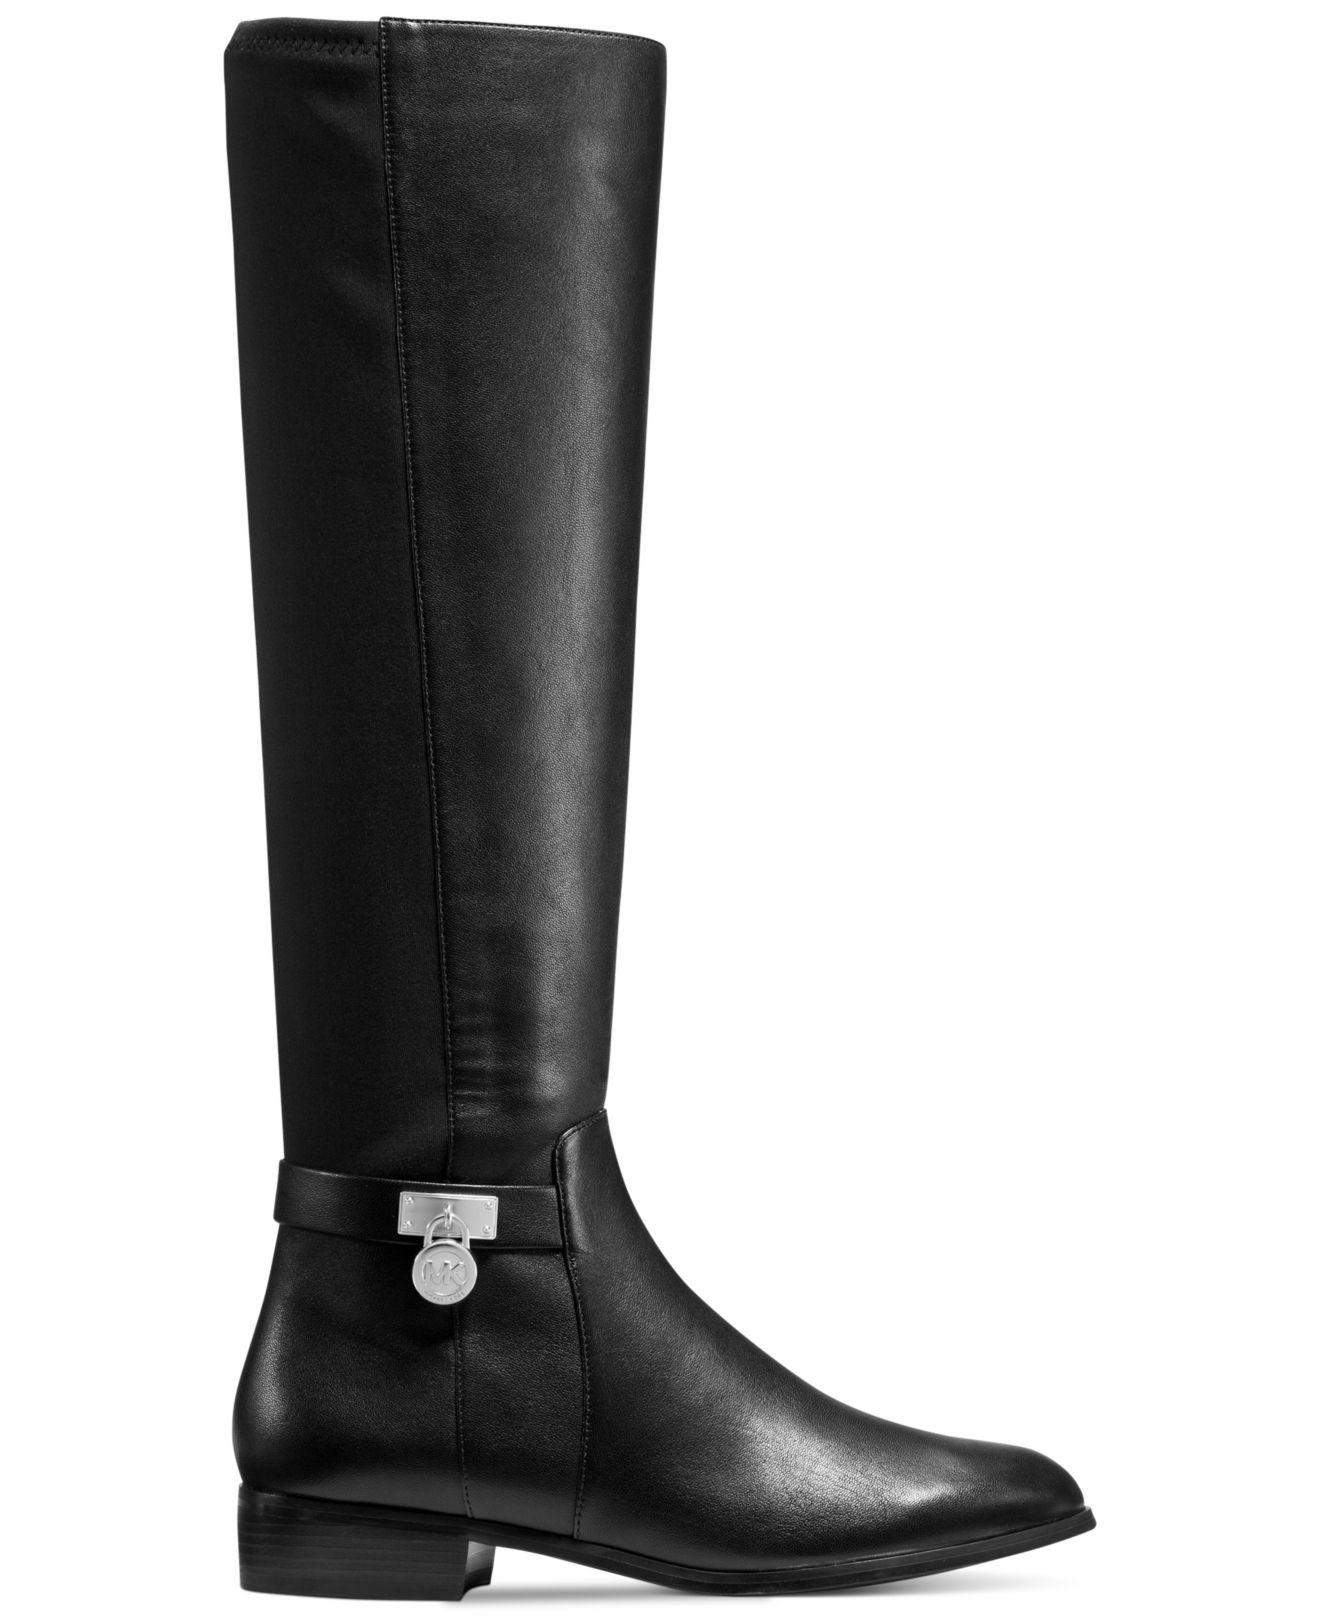 michael kors hamilton 50 50 boots in black lyst